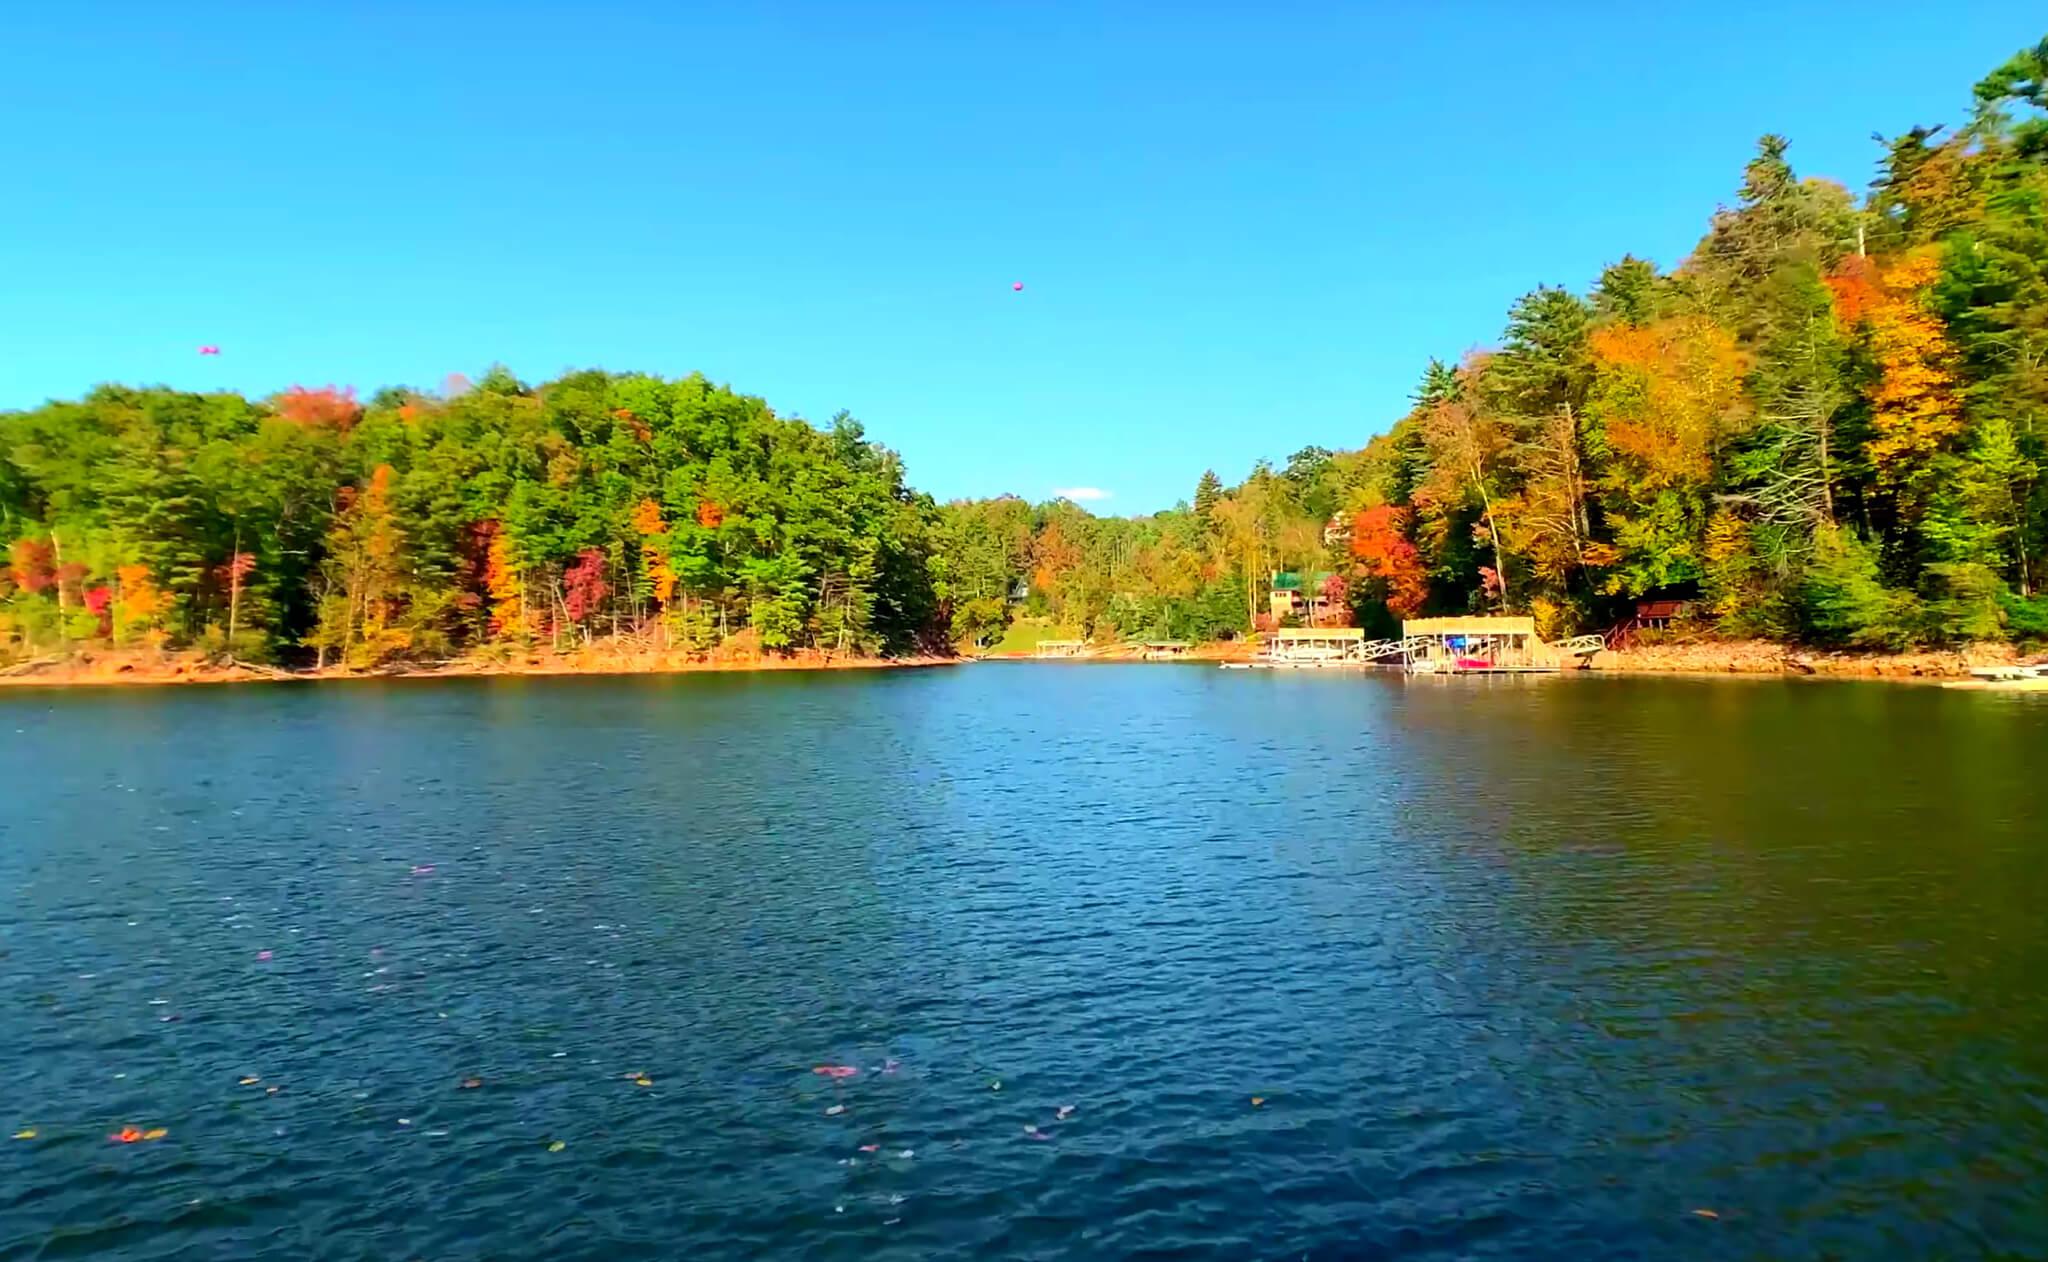 Watauga-Lake-Fishing-Report-Guide-Tennessee-TN-06